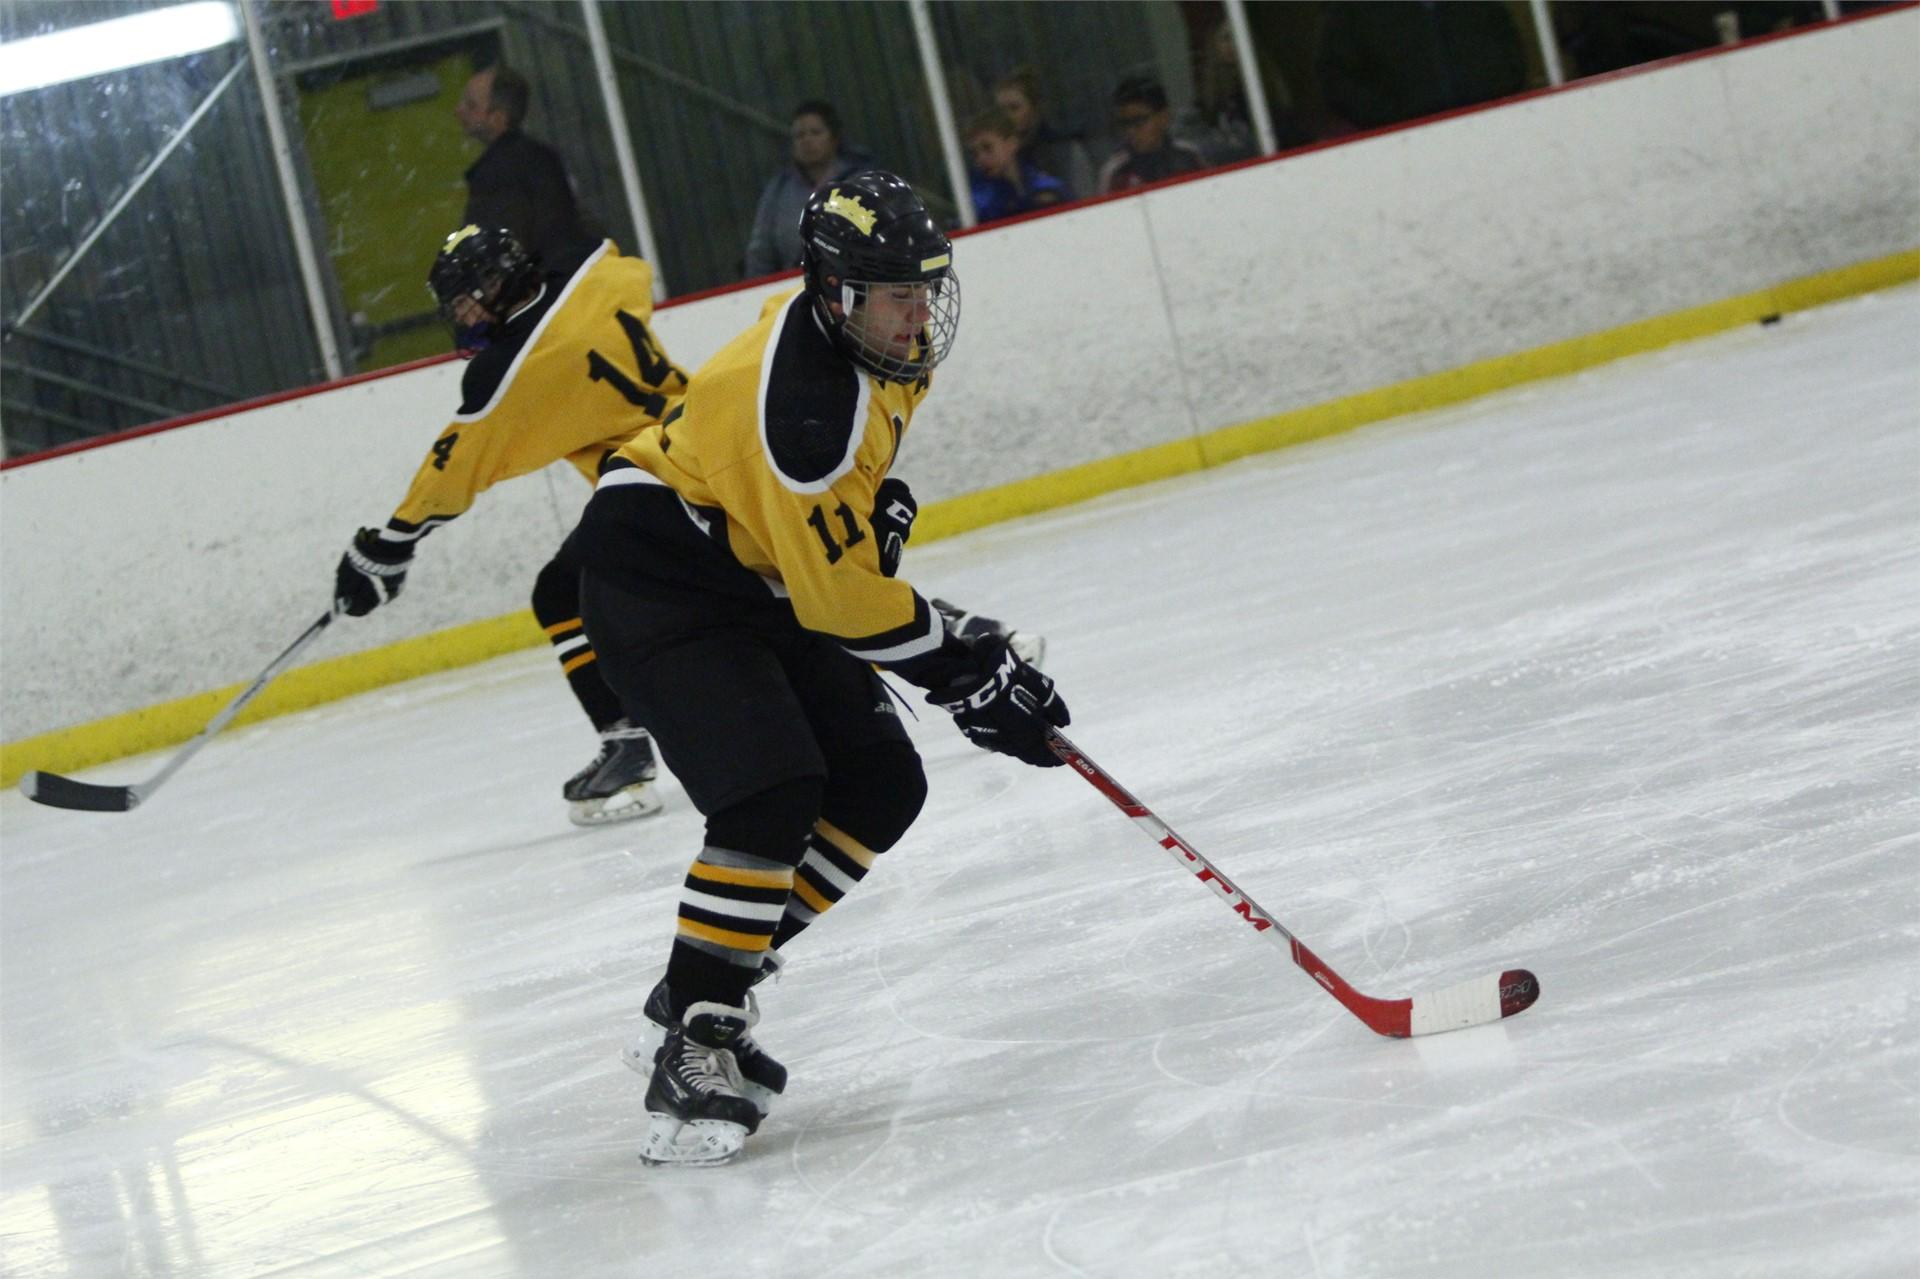 PHS student athlete handling a puck